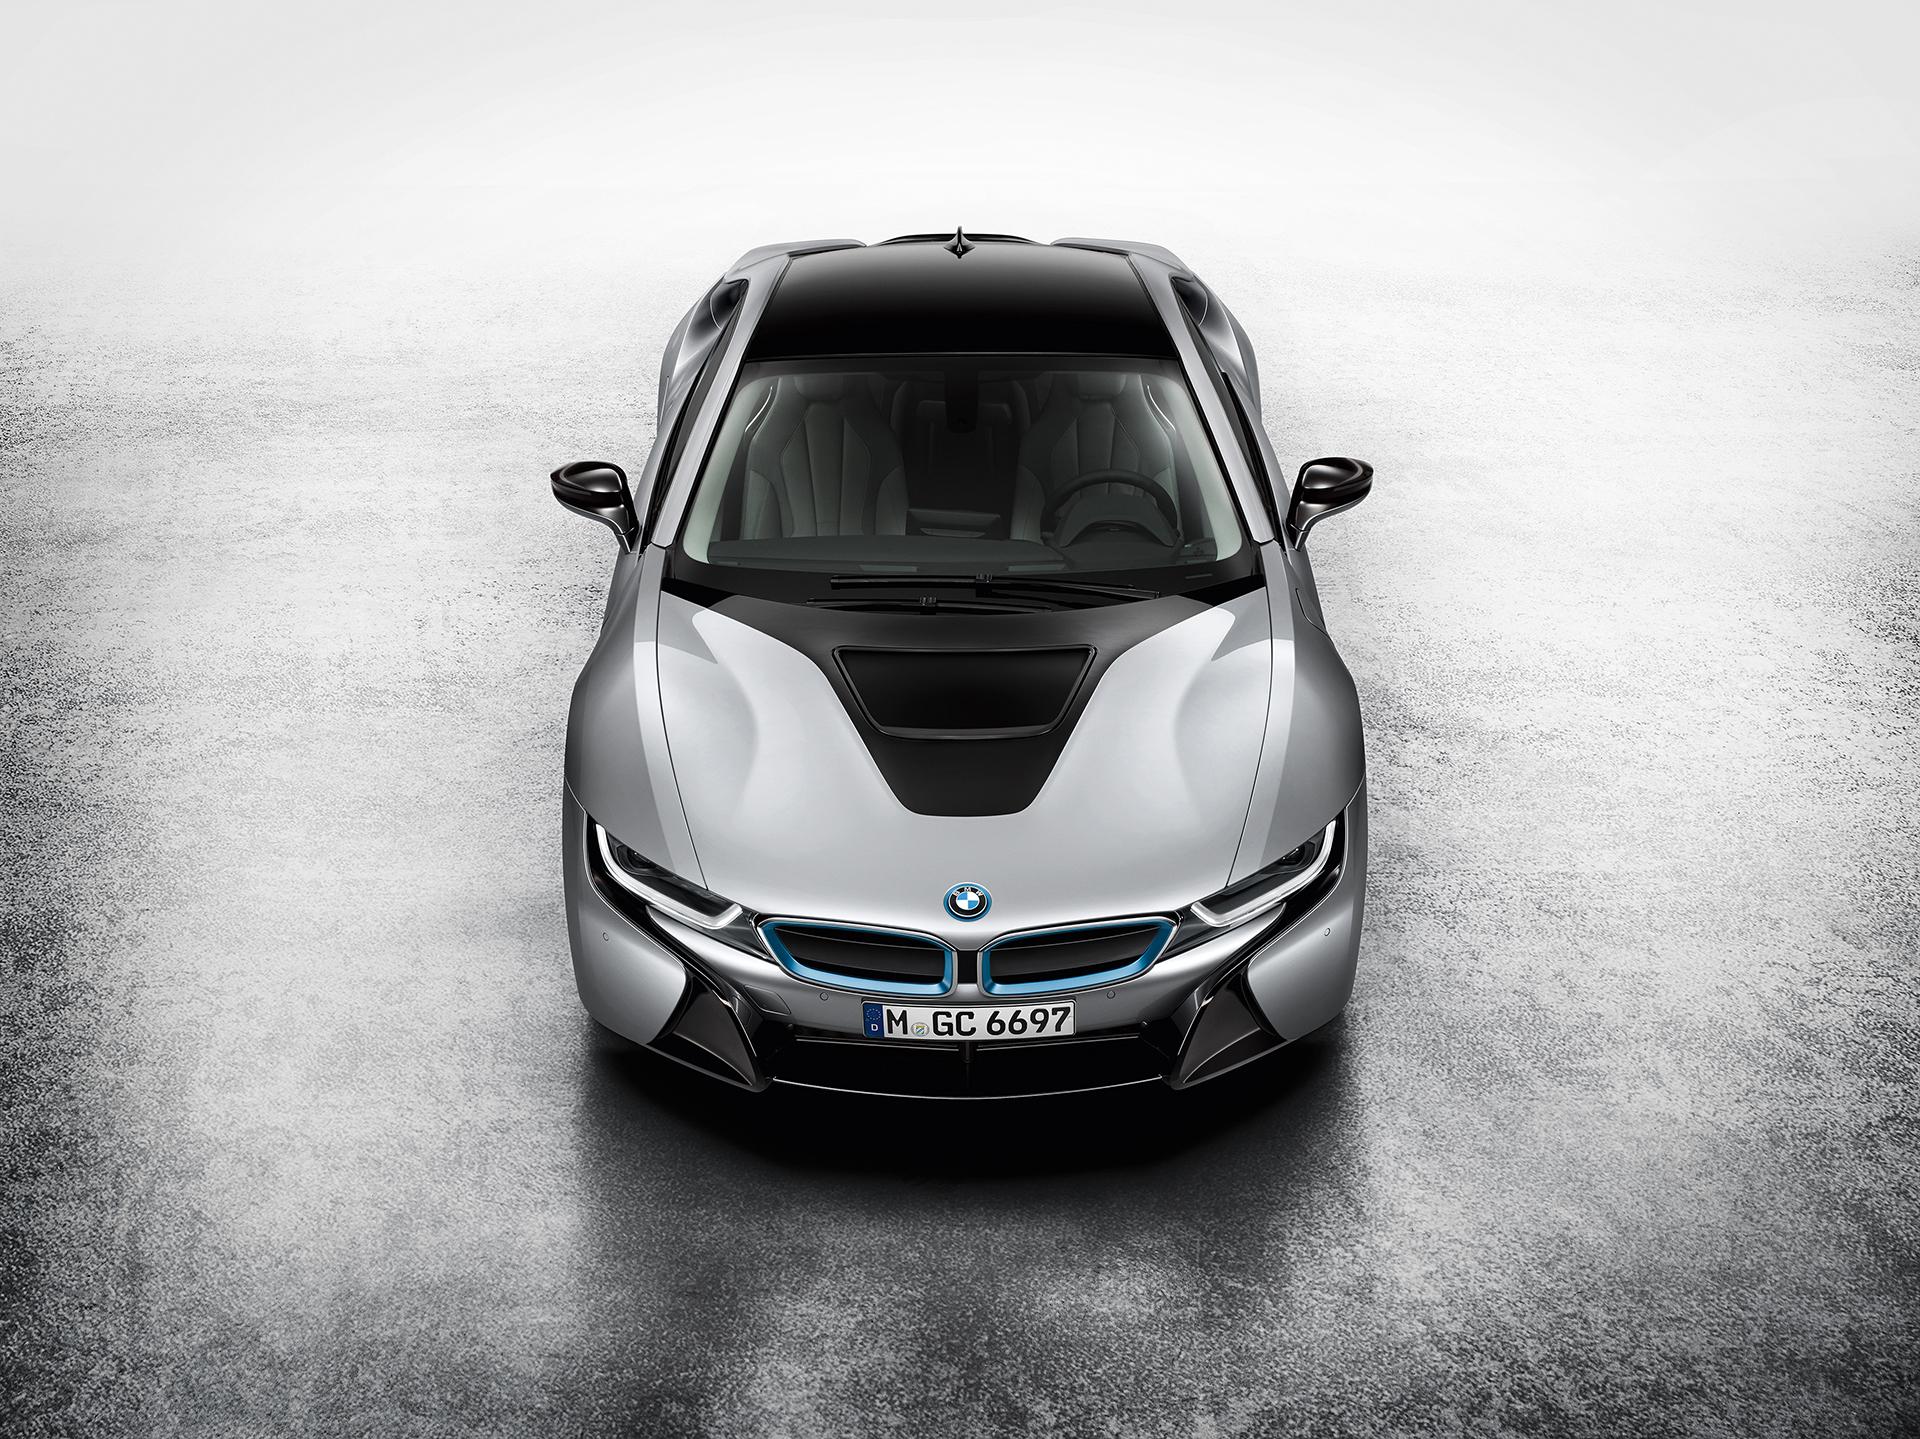 BMW i8 - front top / avant toit